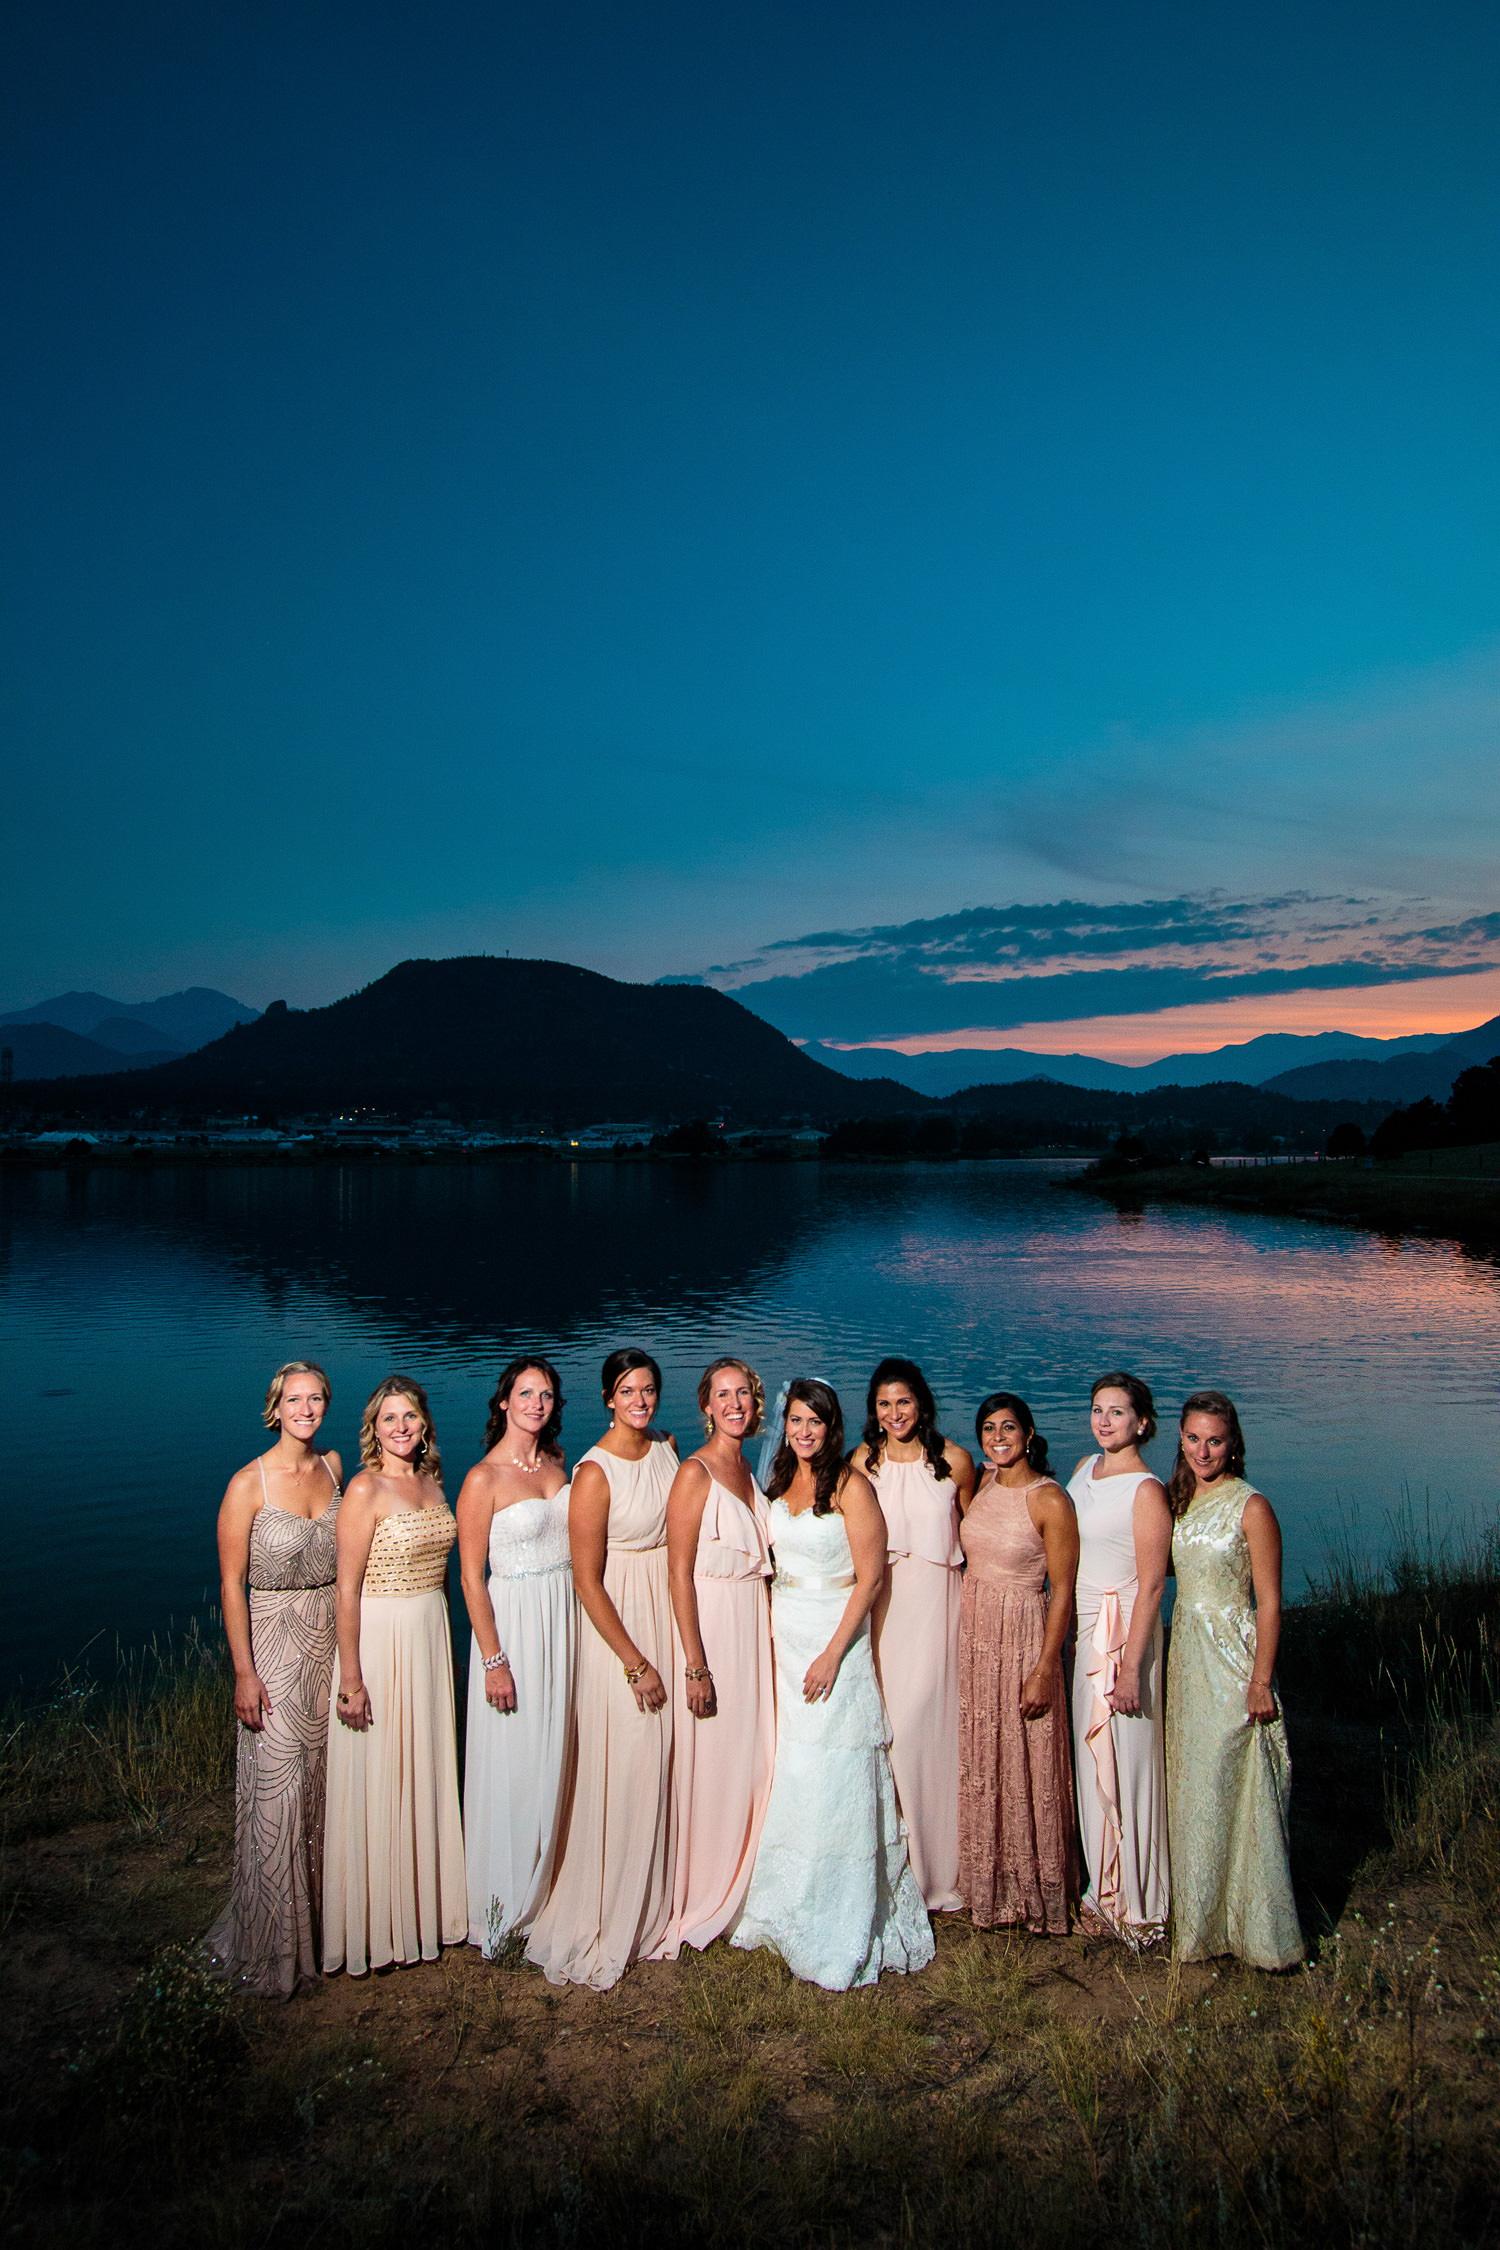 estes-park-resort-wedding-photographer-tomKphoto-027.jpg